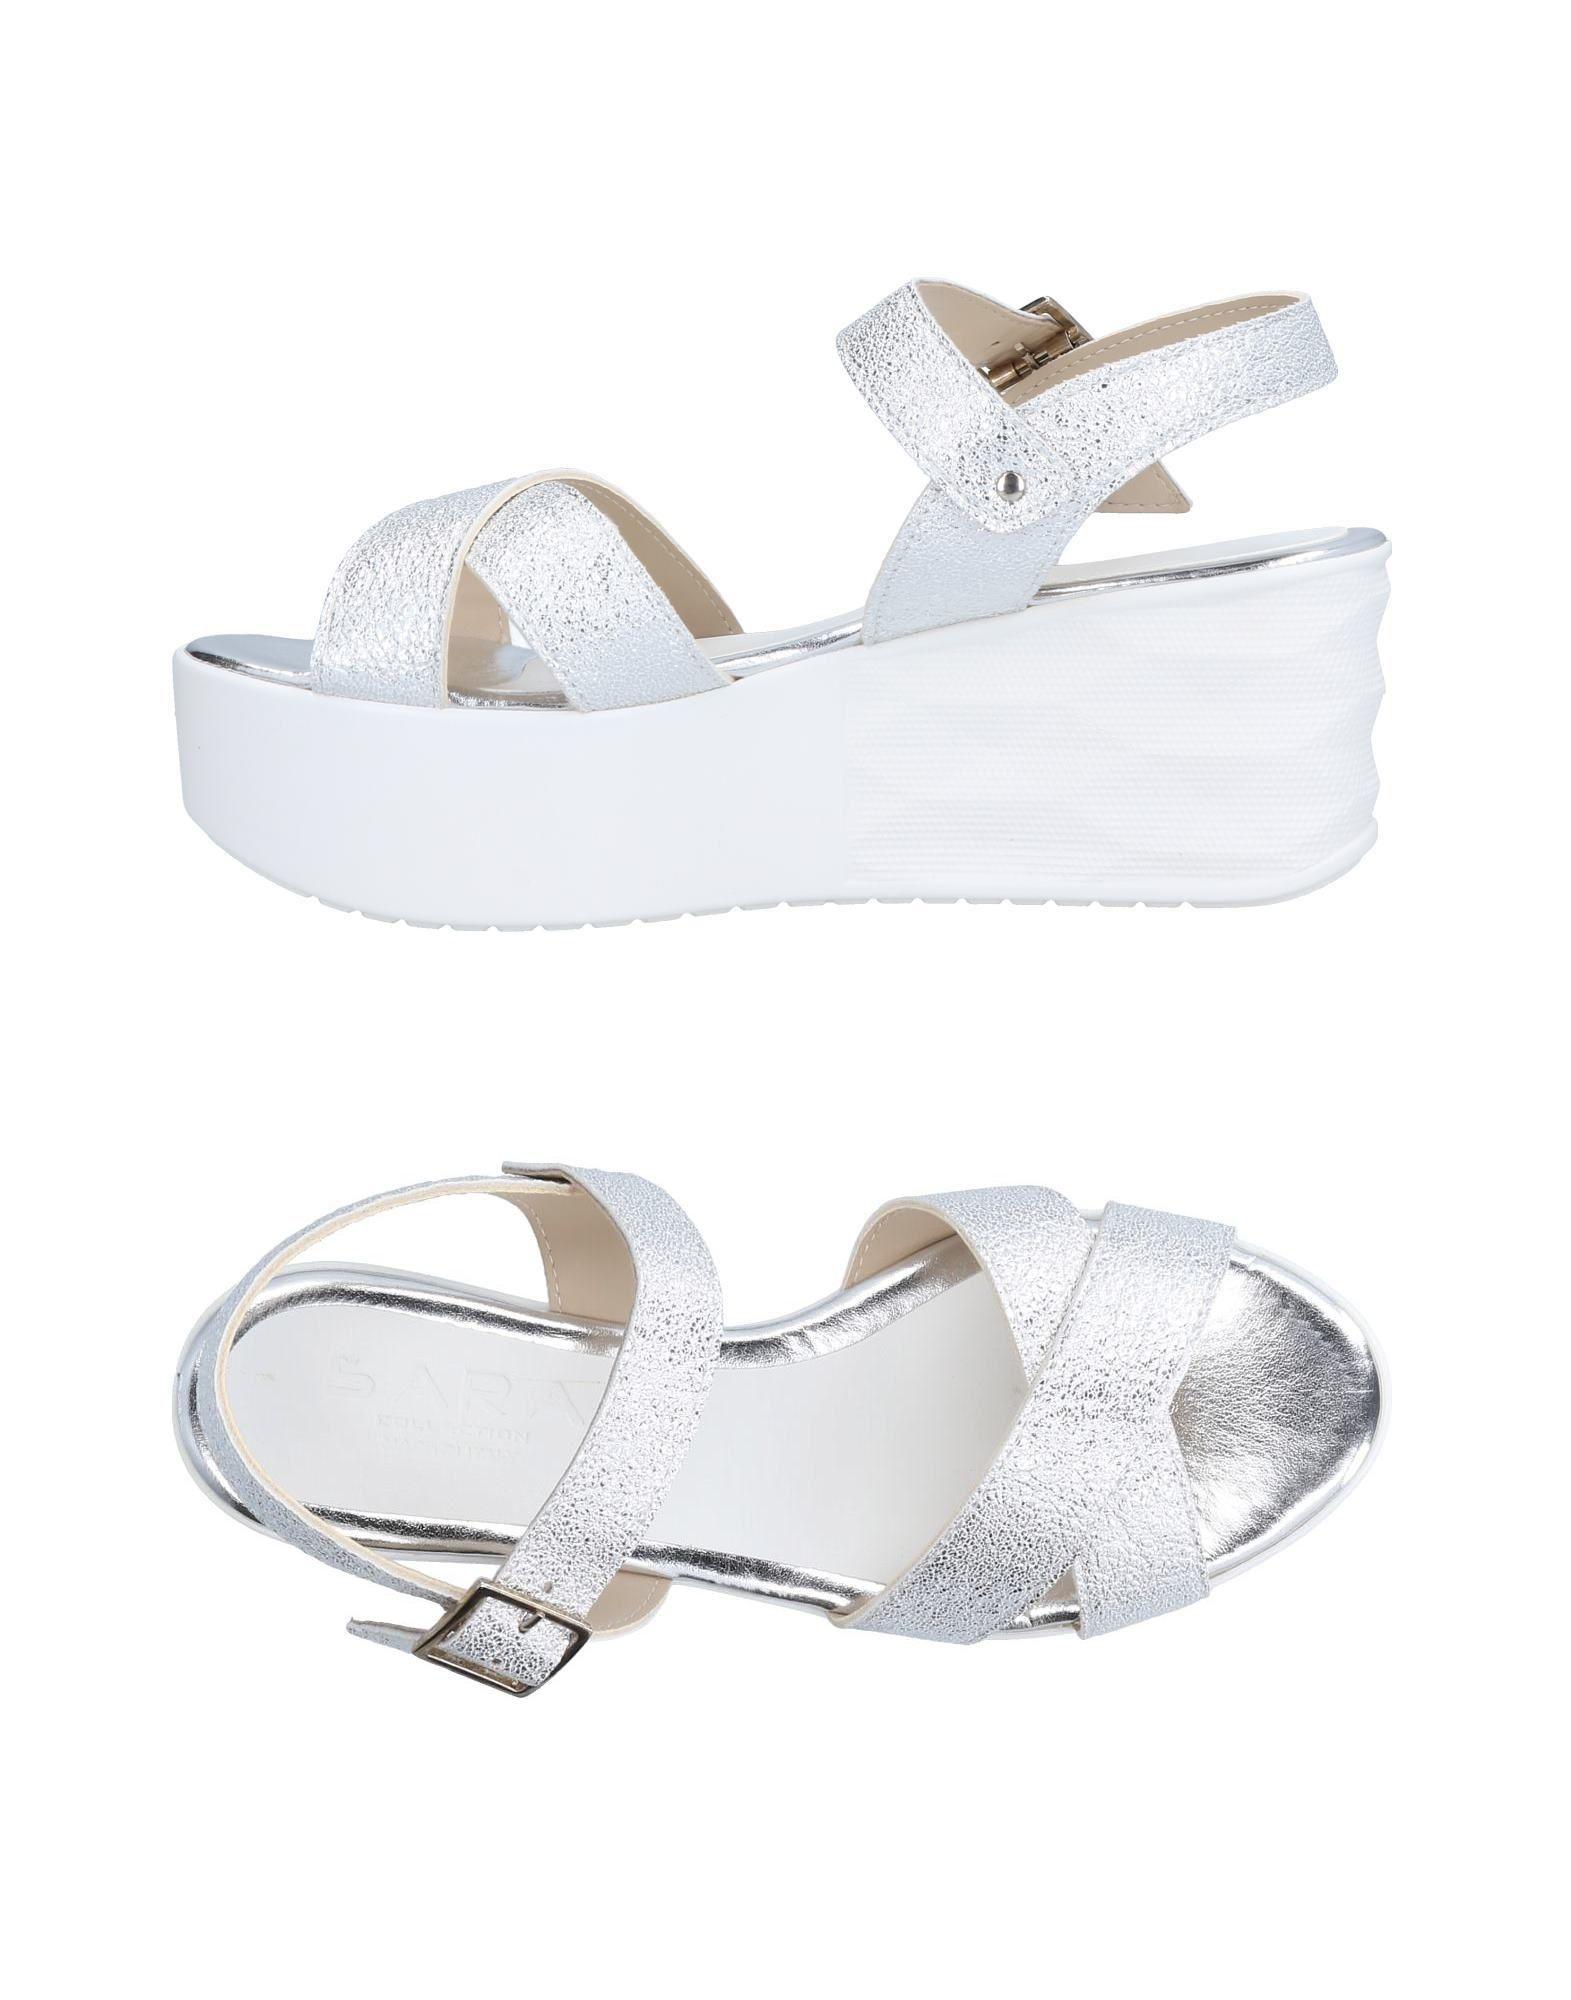 Sara Sandalen Damen  11507658LK Gute Qualität beliebte Schuhe